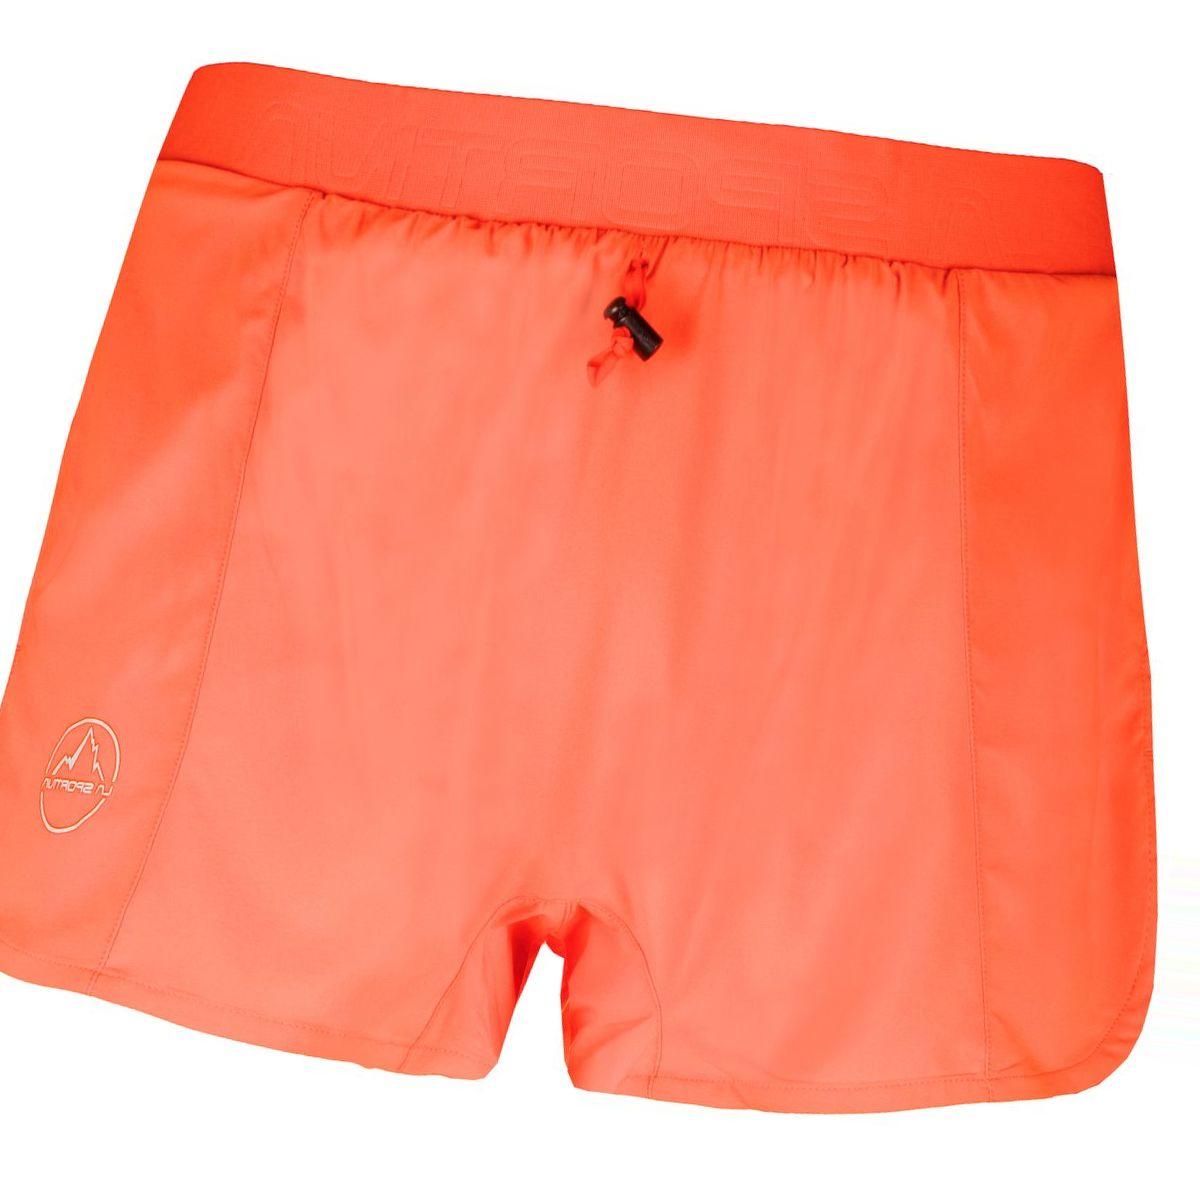 La Sportiva Auster Short - Men's